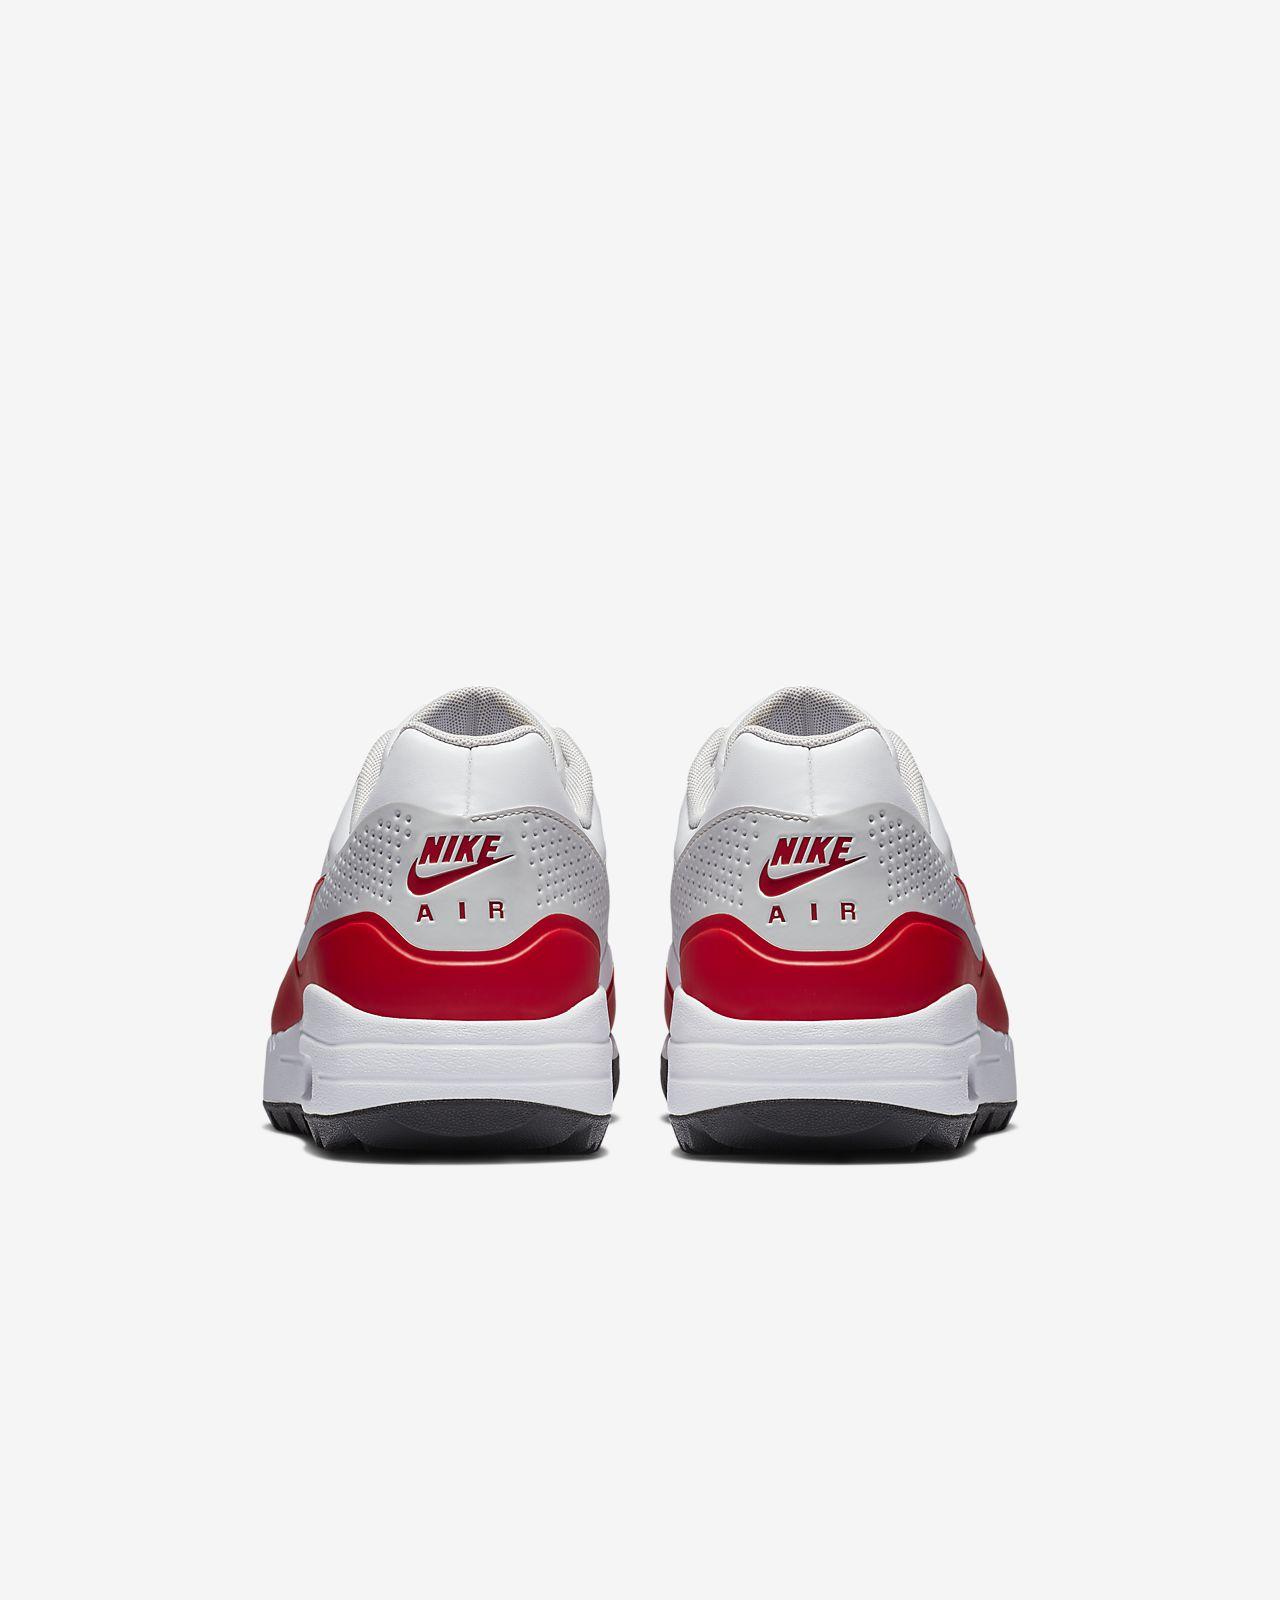 sports shoes faecf 5ec11 ... Chaussure de golf Nike Air Max 1 G pour Homme